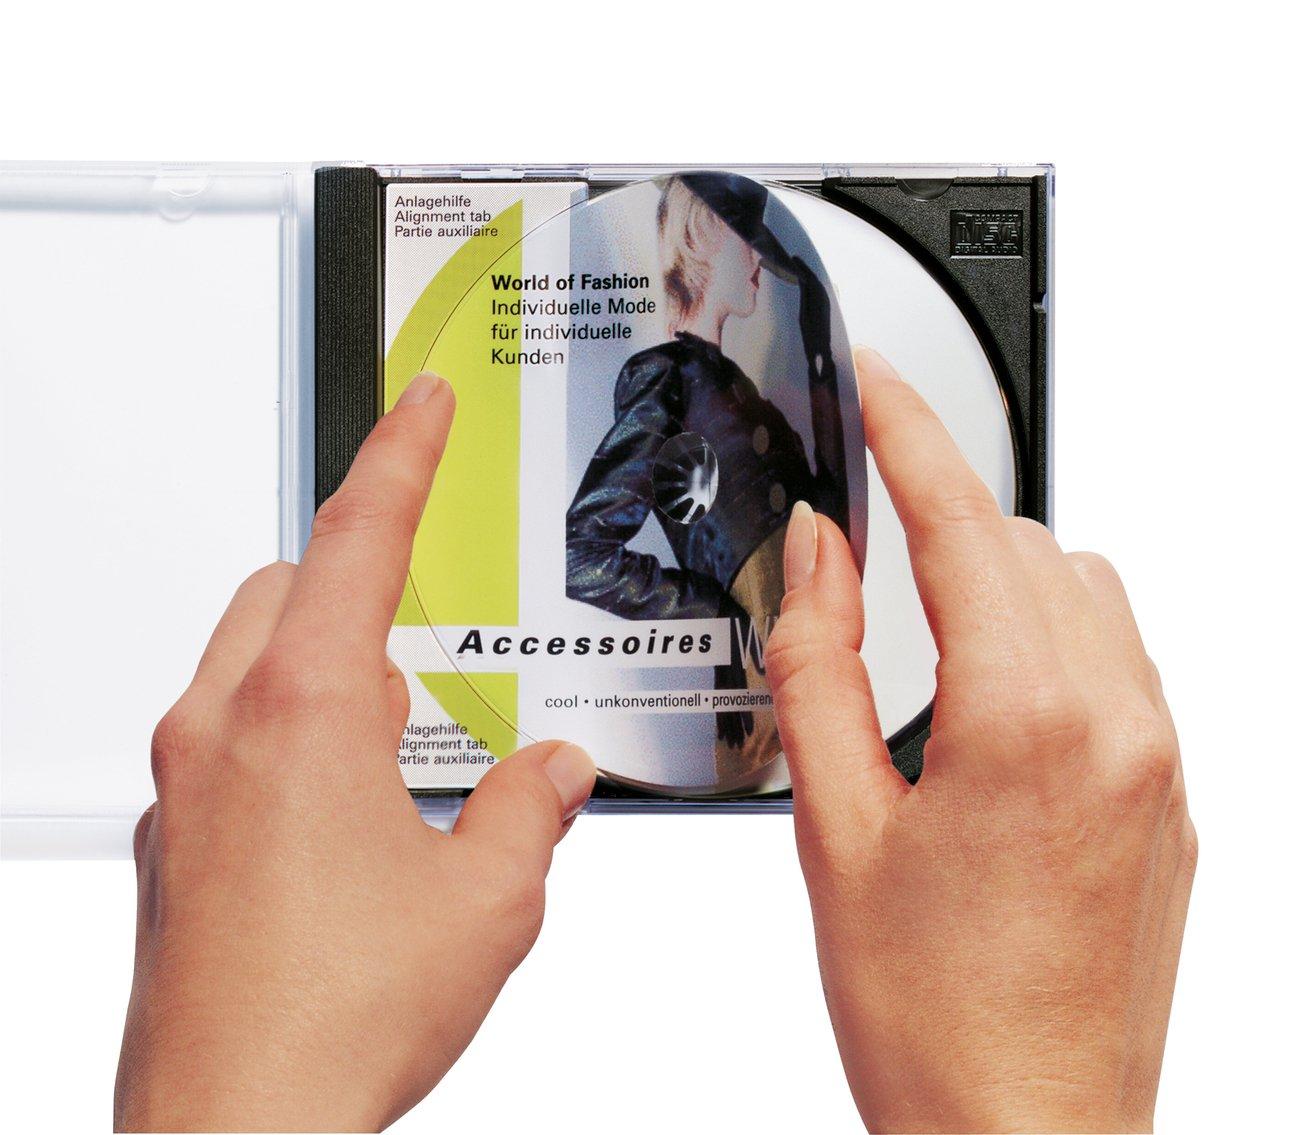 20 Aufkleber wei/ß Zentrierhilfe bedruckbar 10 Blatt DIN A4 Papier gl/änzend selbstklebend /Ø 116 mm, Innenloch gro/ß Herma 8900 Tintenstrahldrucker CD Etiketten Foto-Qualit/ät glossy